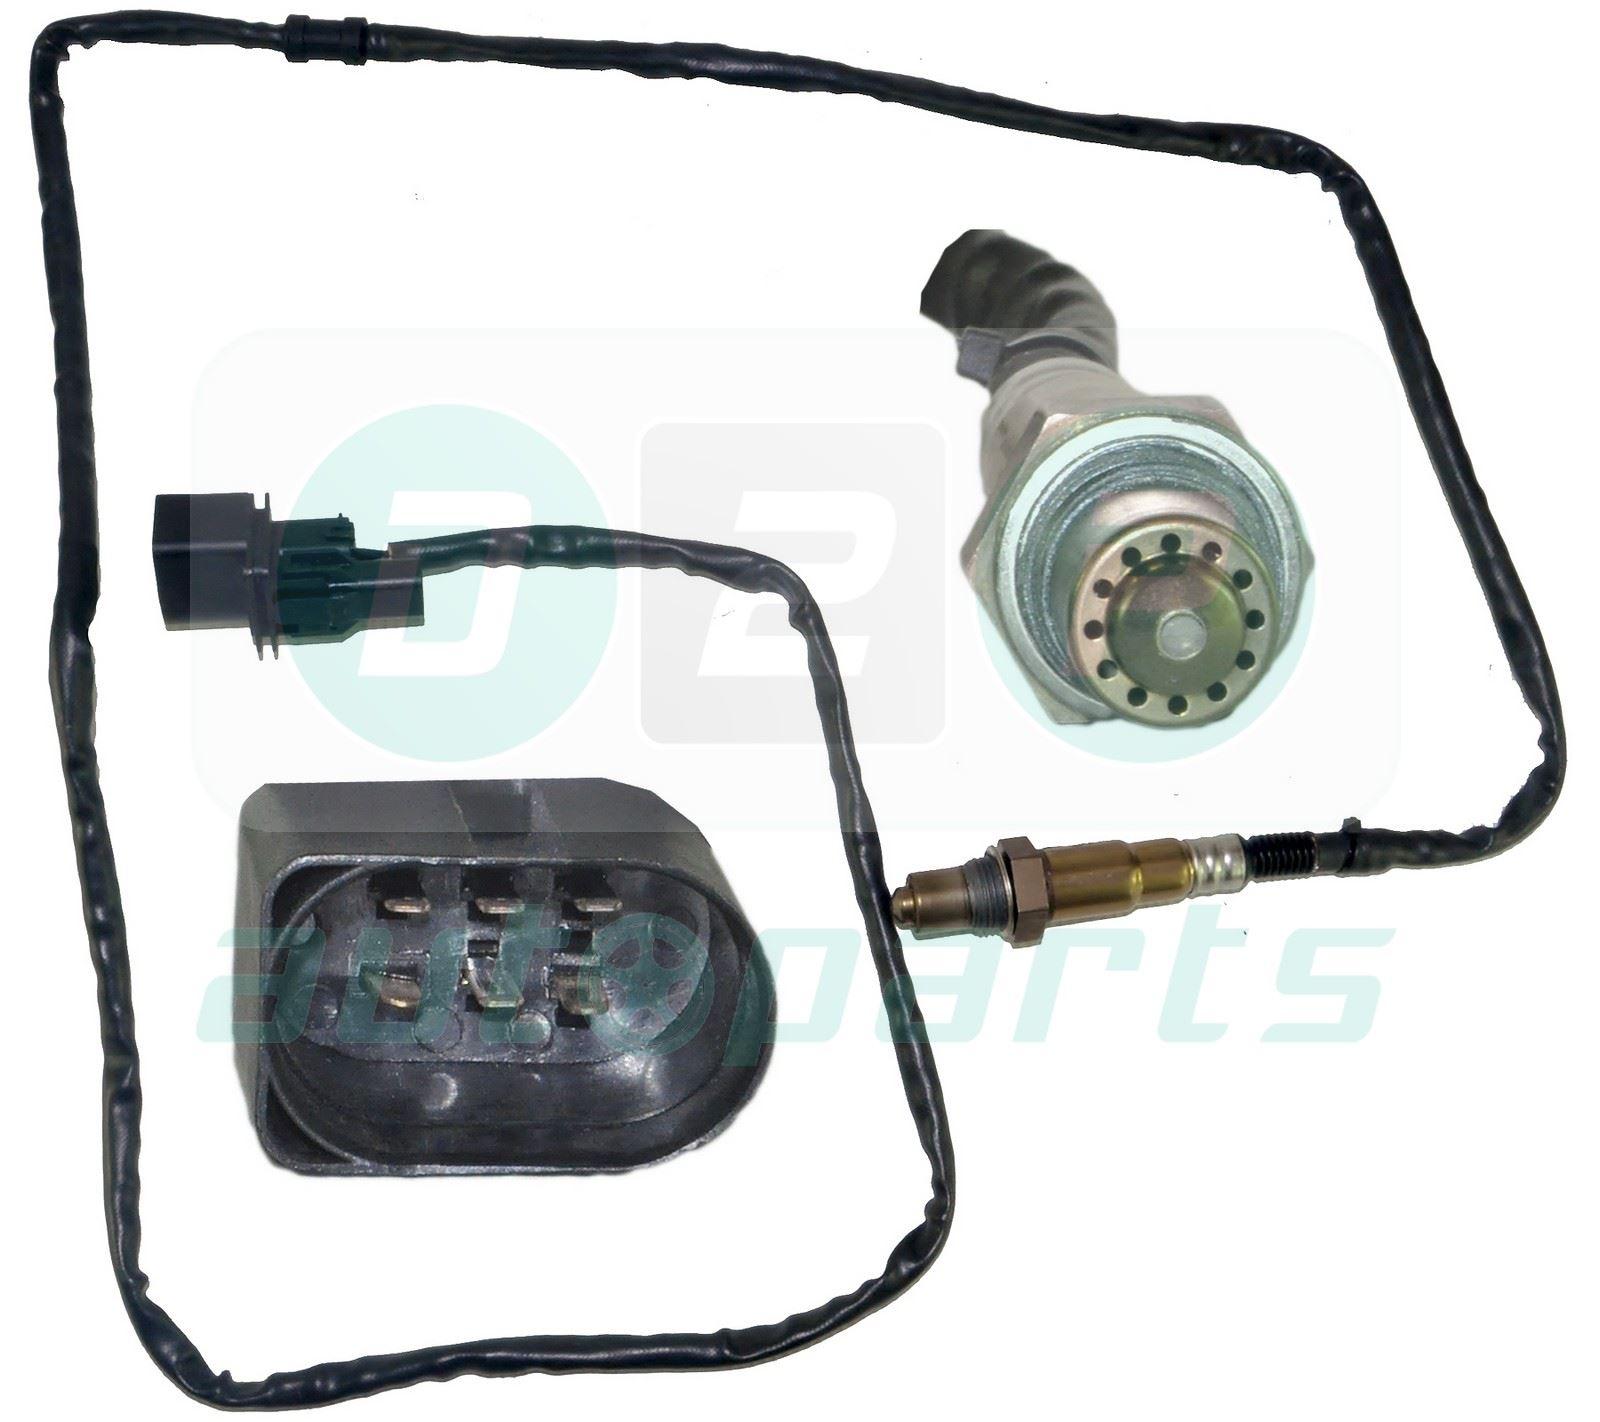 bosch lambda sensor wiring diagram bmw e92 audio for vw golf mk5 1 4fsi 6 fsi 5 wire direct fit oxygen